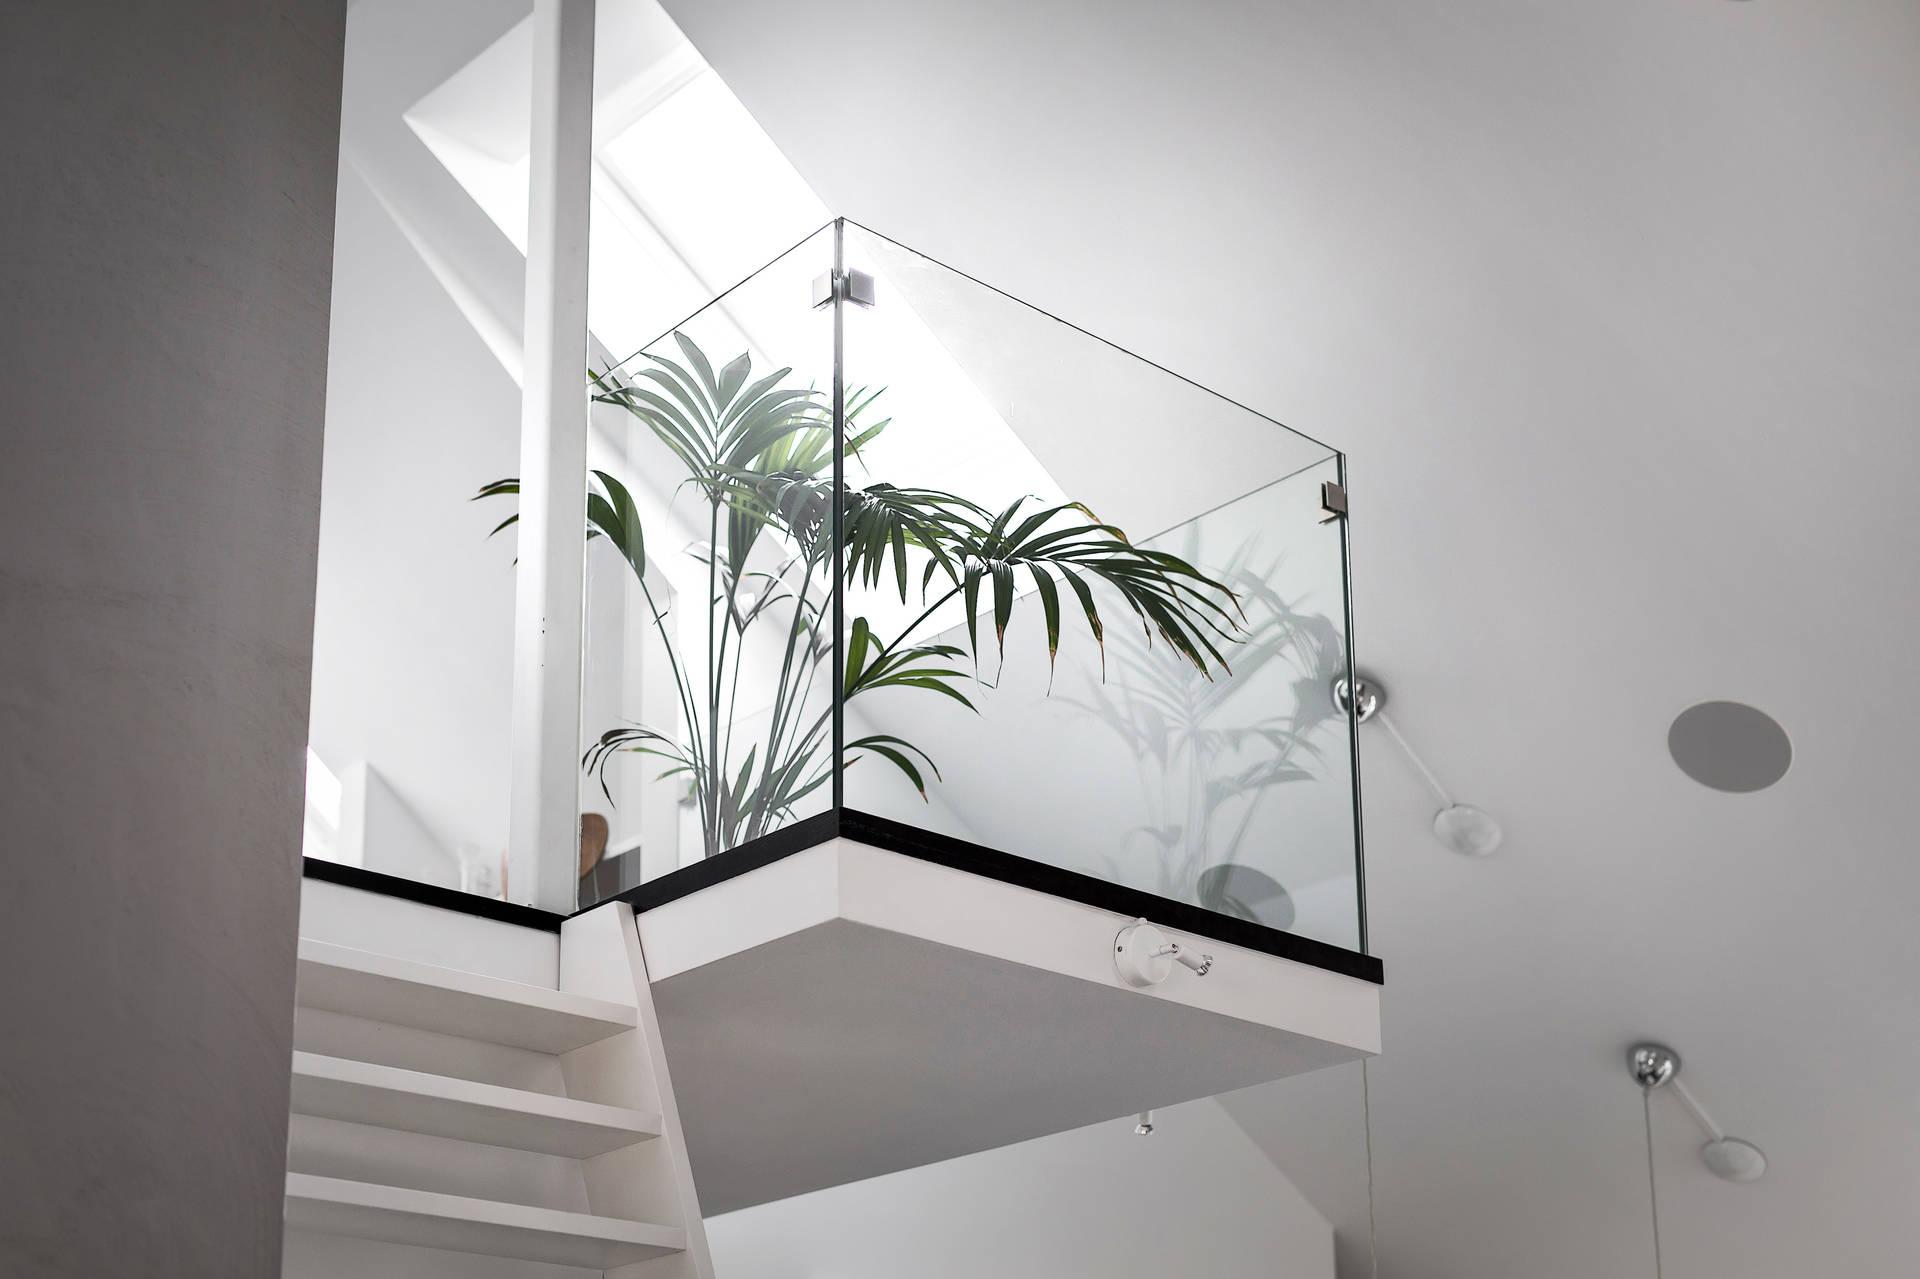 Szklana balustrada na antresoli